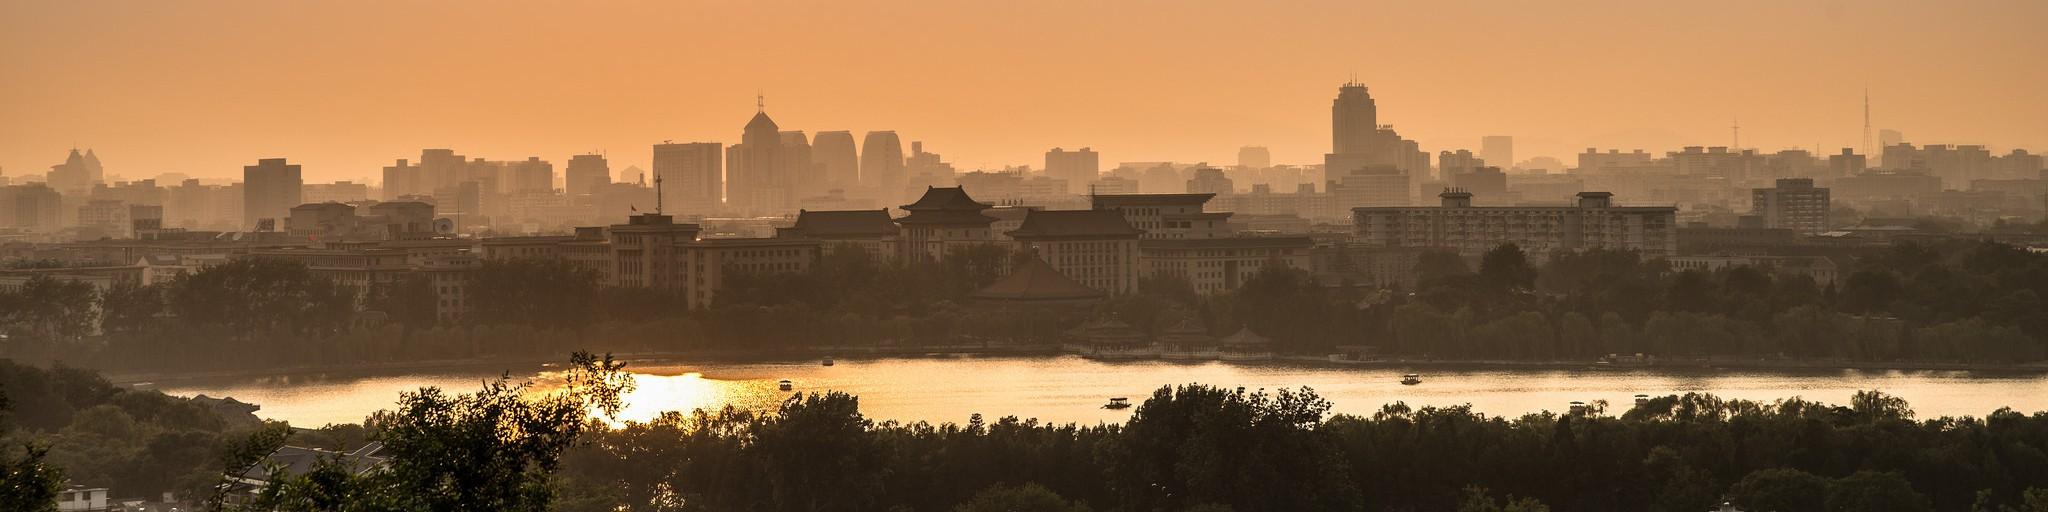 Smog covering Beijing